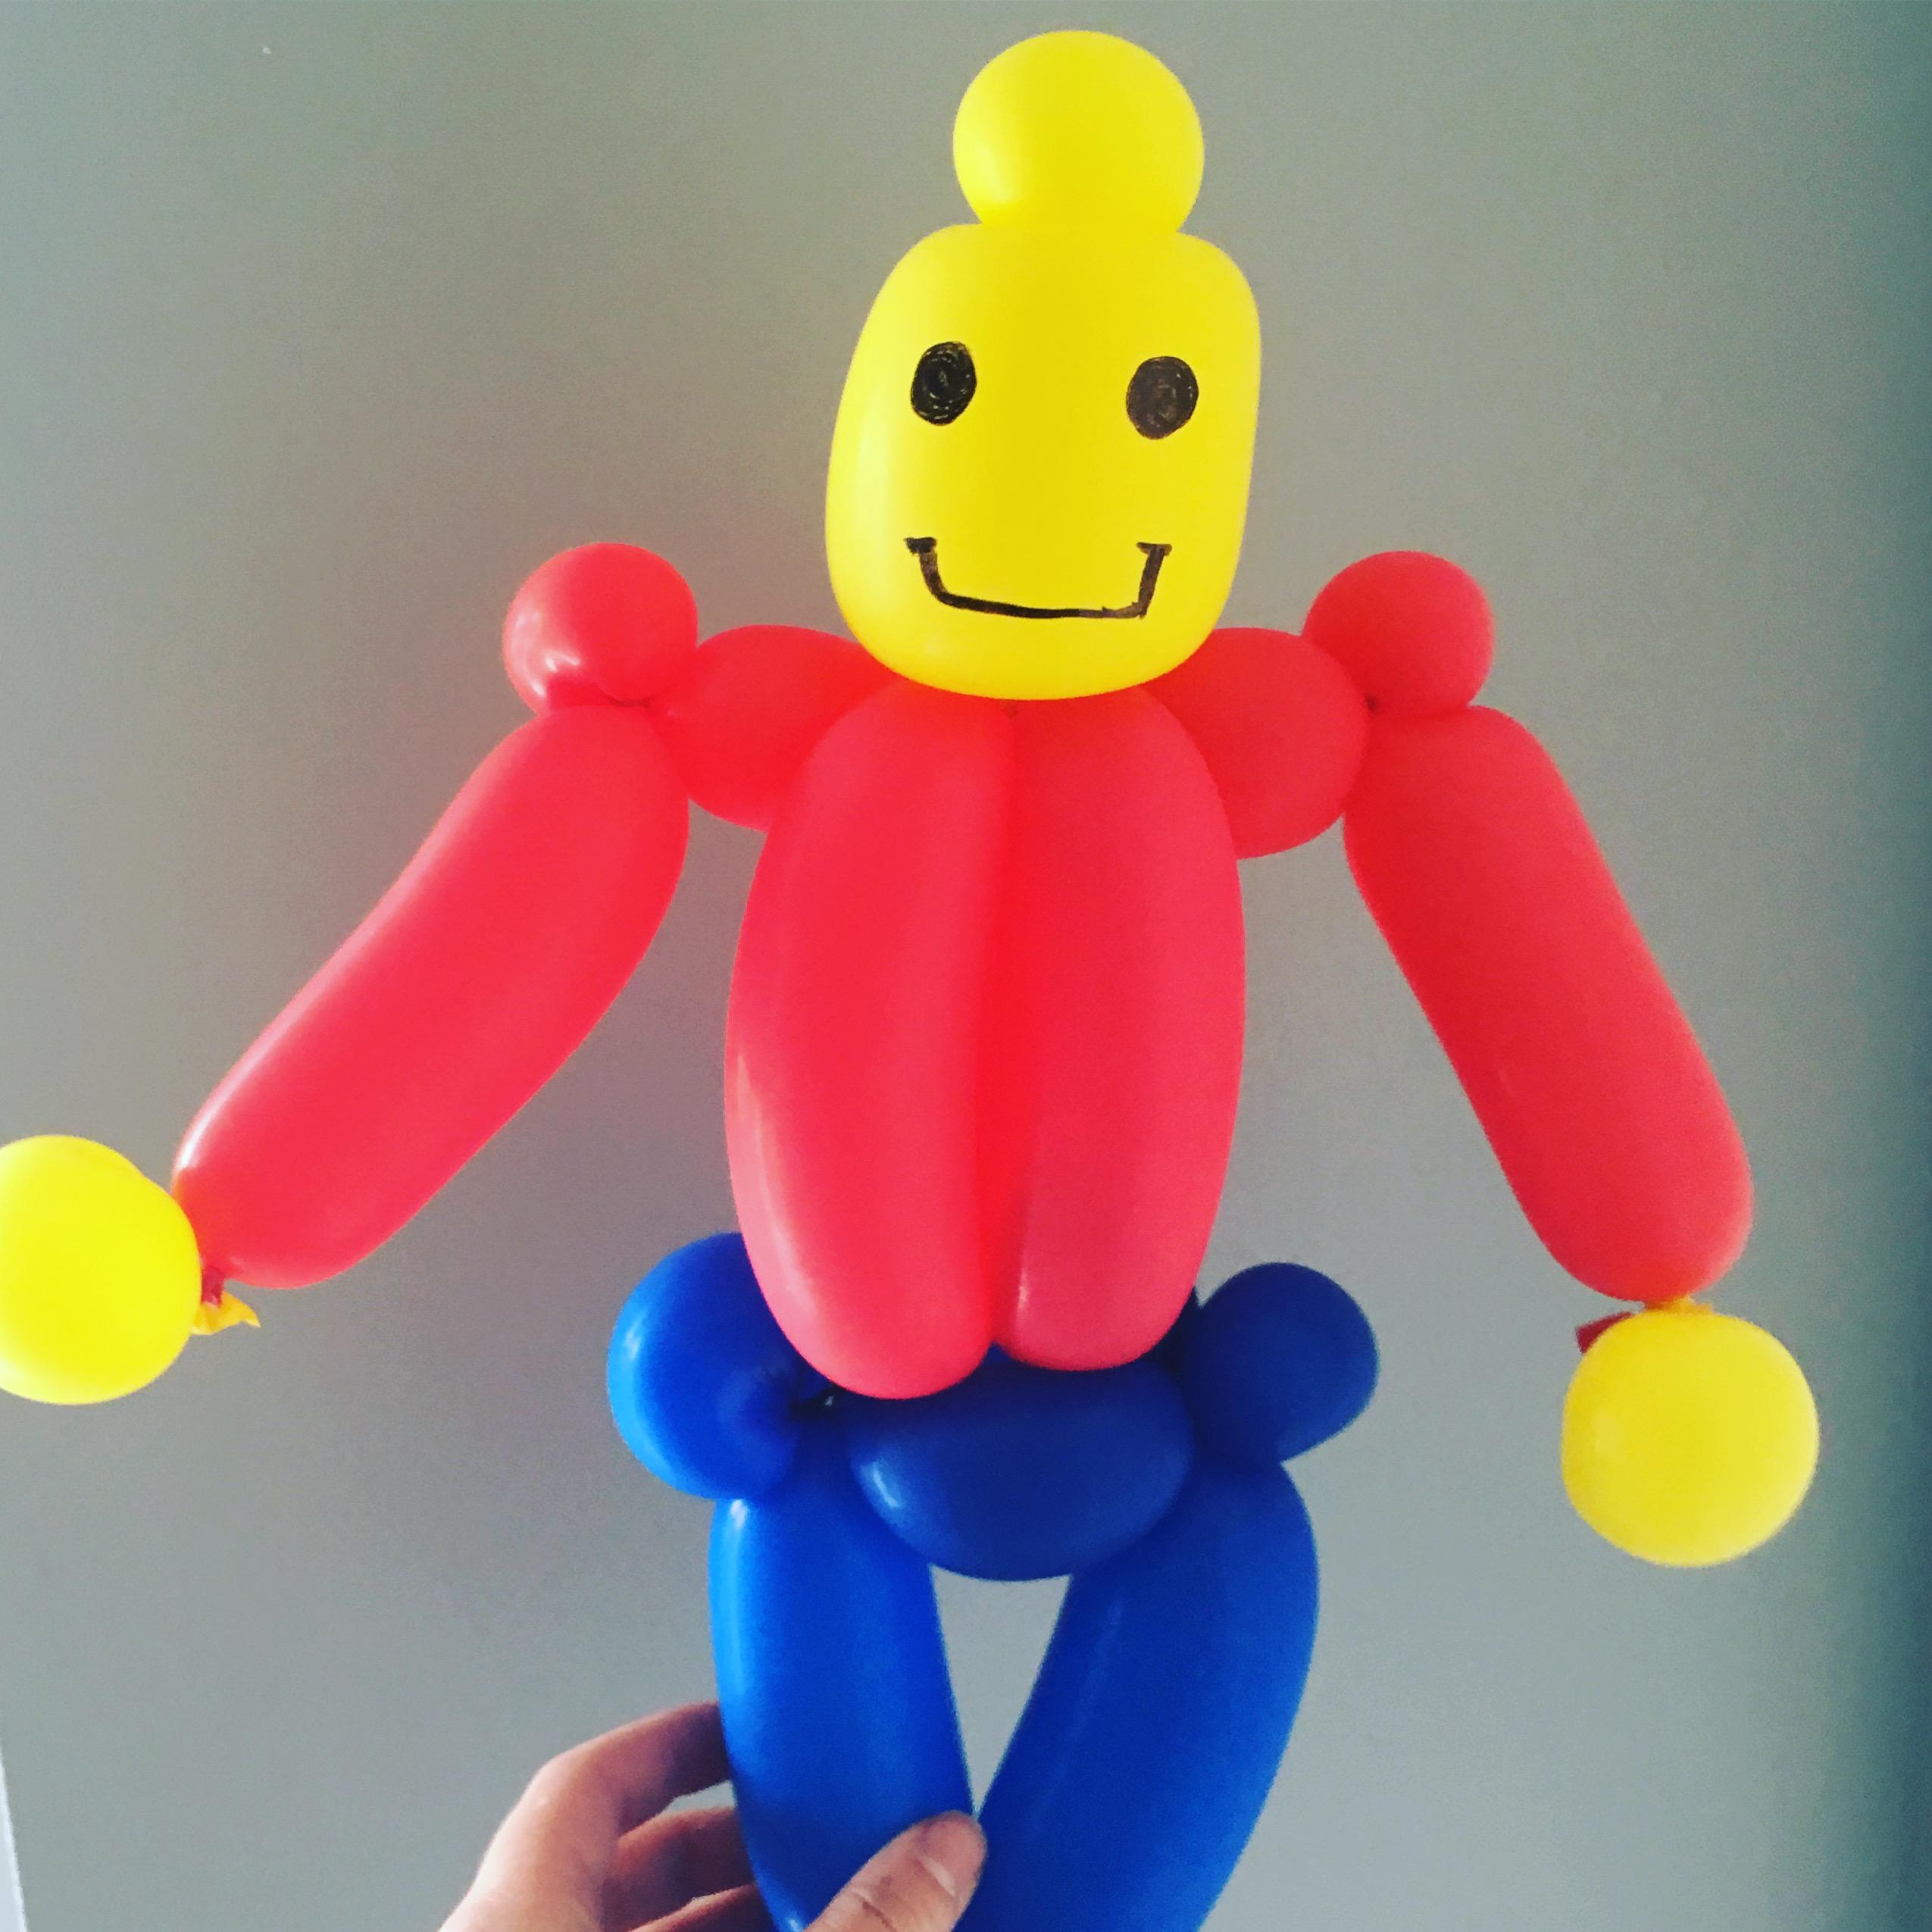 Lego man balloon model